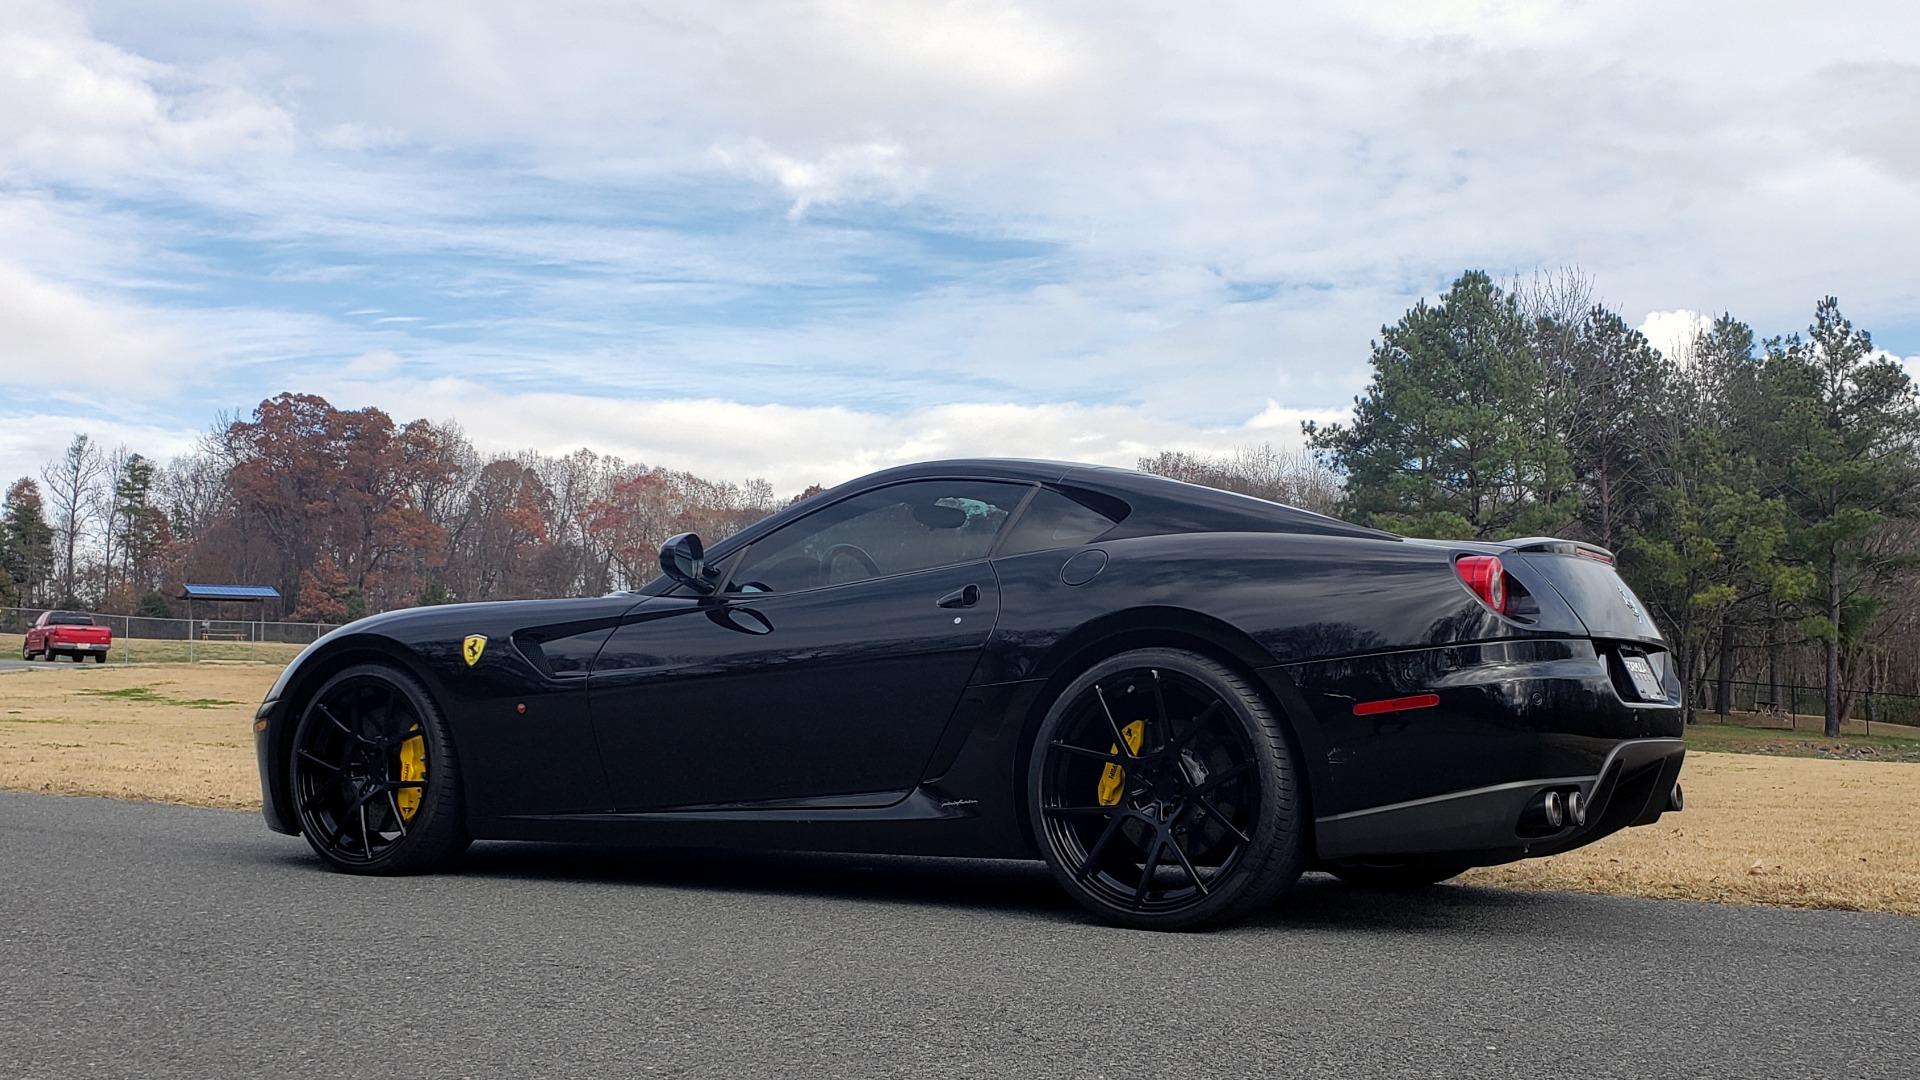 Used 2007 Ferrari 599 GTB FIORANO HGTE / V12 / F1 TRANS / NAV / BOSE / CUSTOM WHEELS for sale $109,999 at Formula Imports in Charlotte NC 28227 7